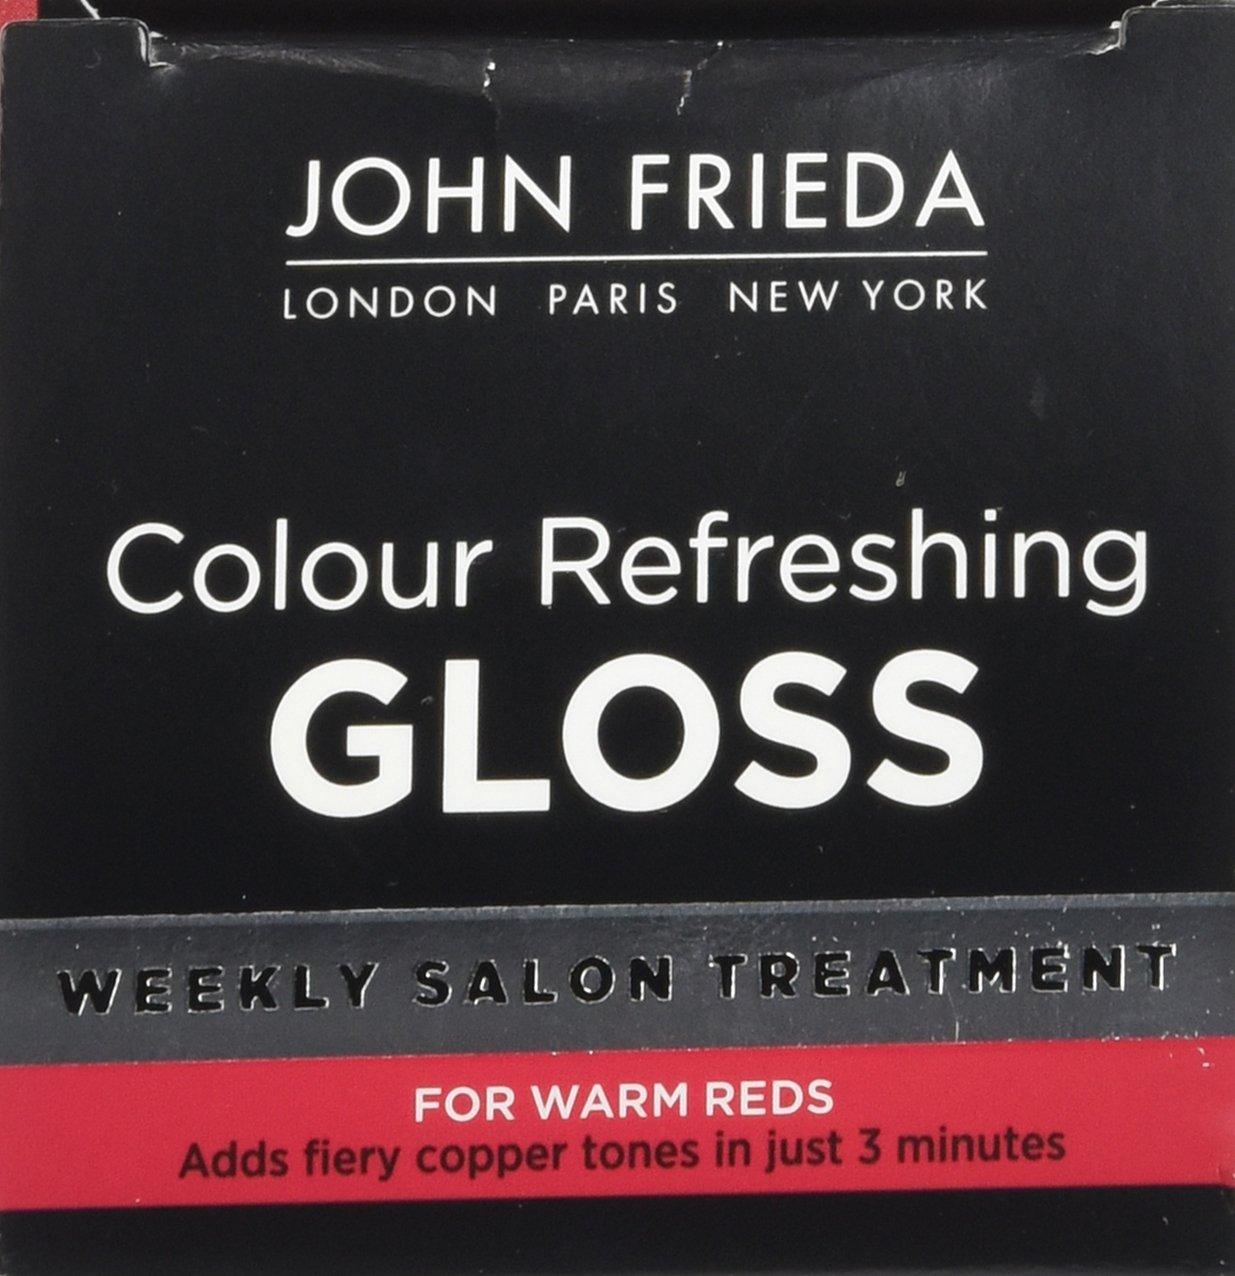 John Frieda Colour Refreshing Gloss, Warm Red, 6 Ounce by John Frieda PFC (Image #1)